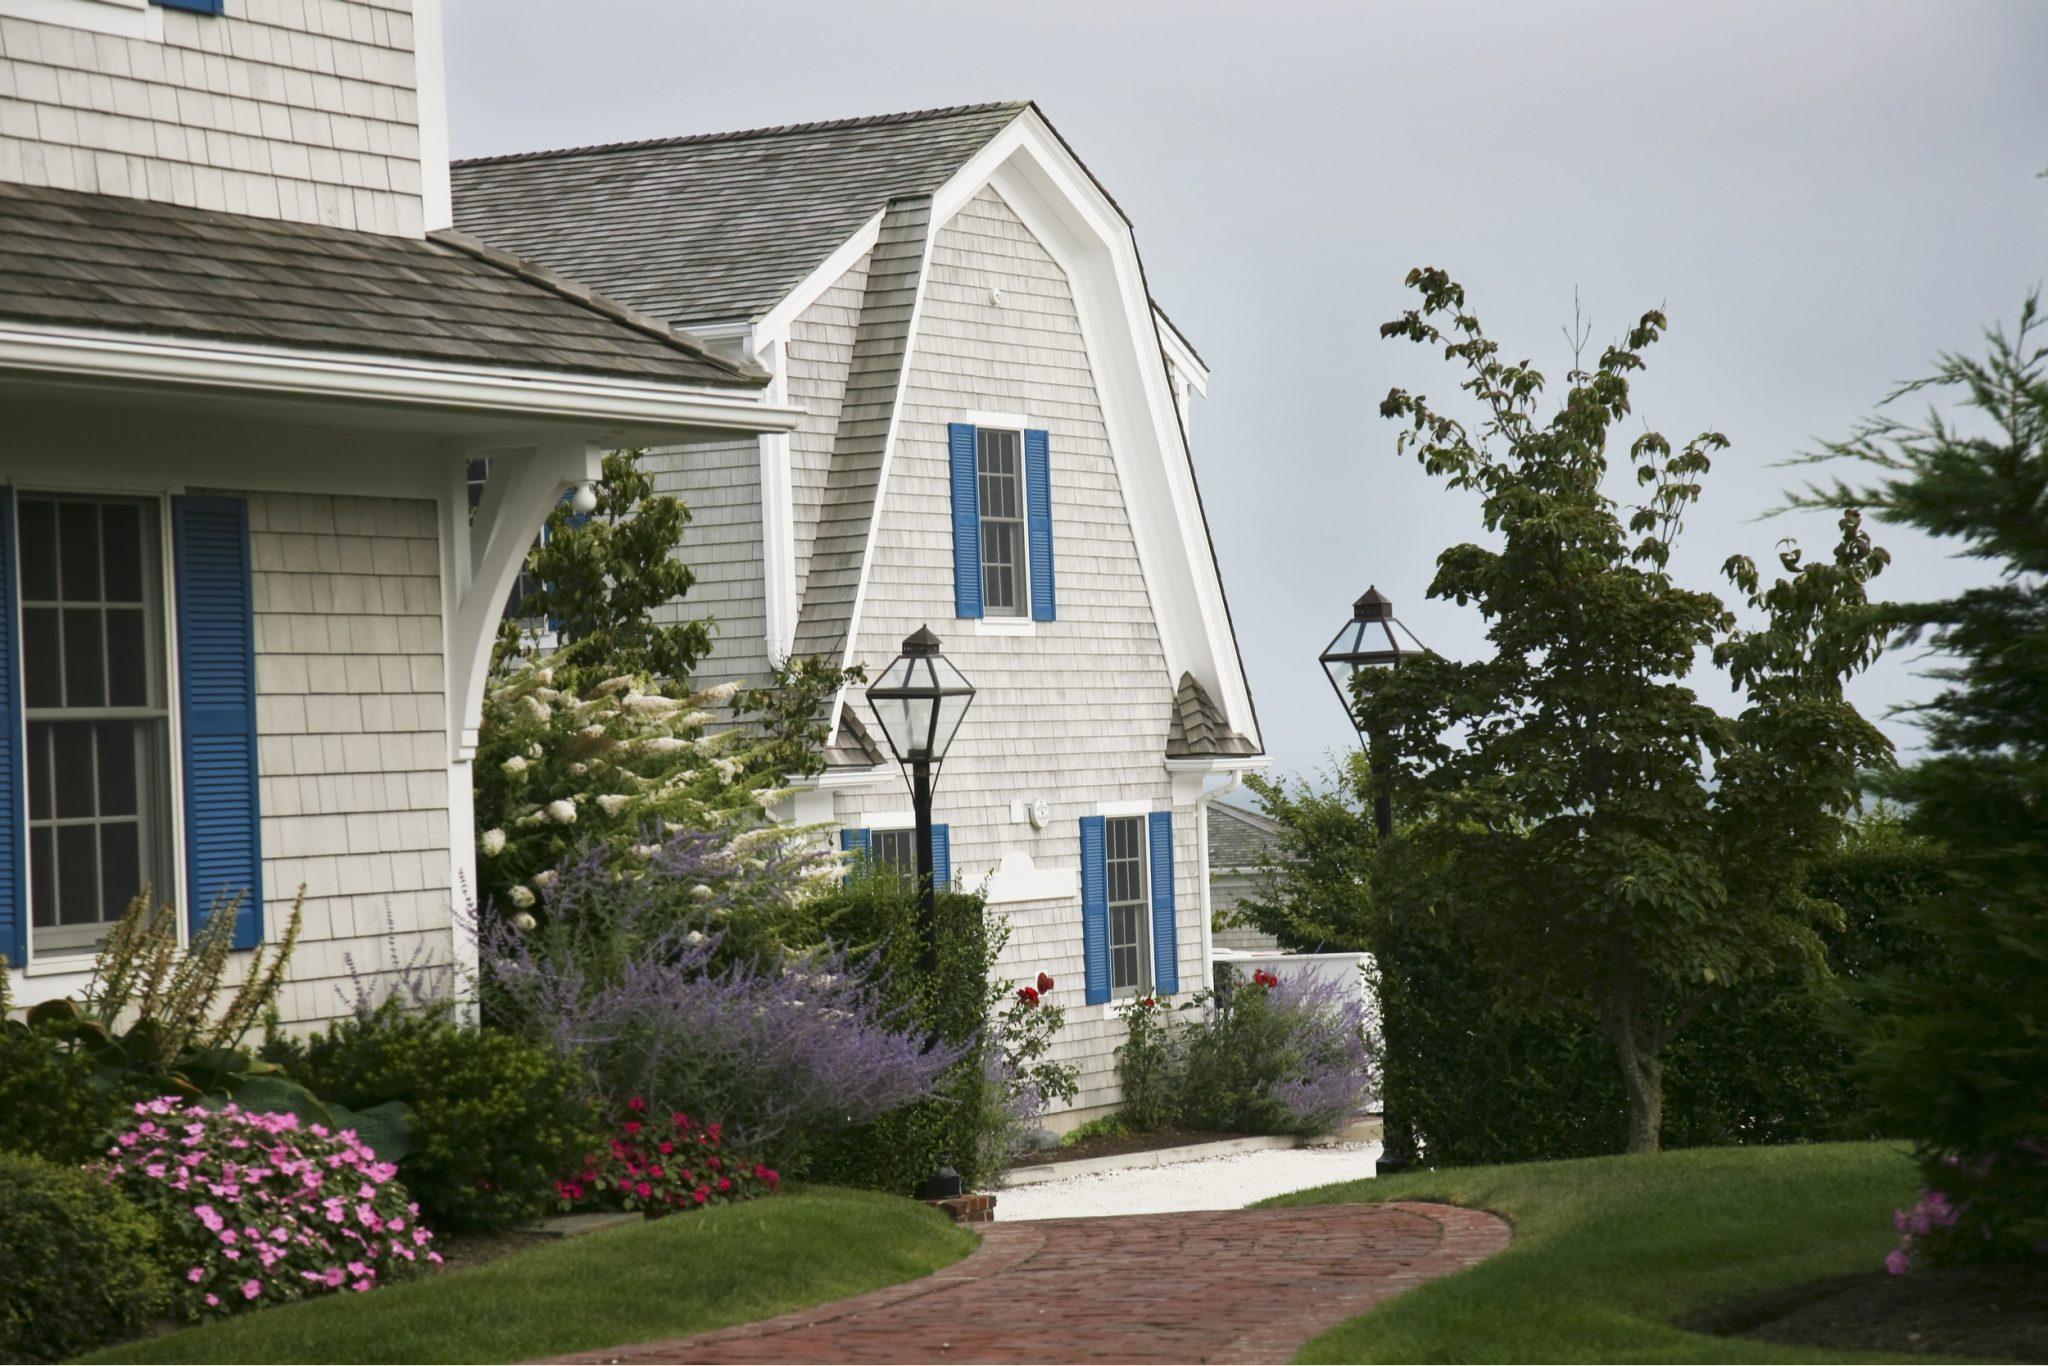 Cape Cod Style Home Driveway Designs